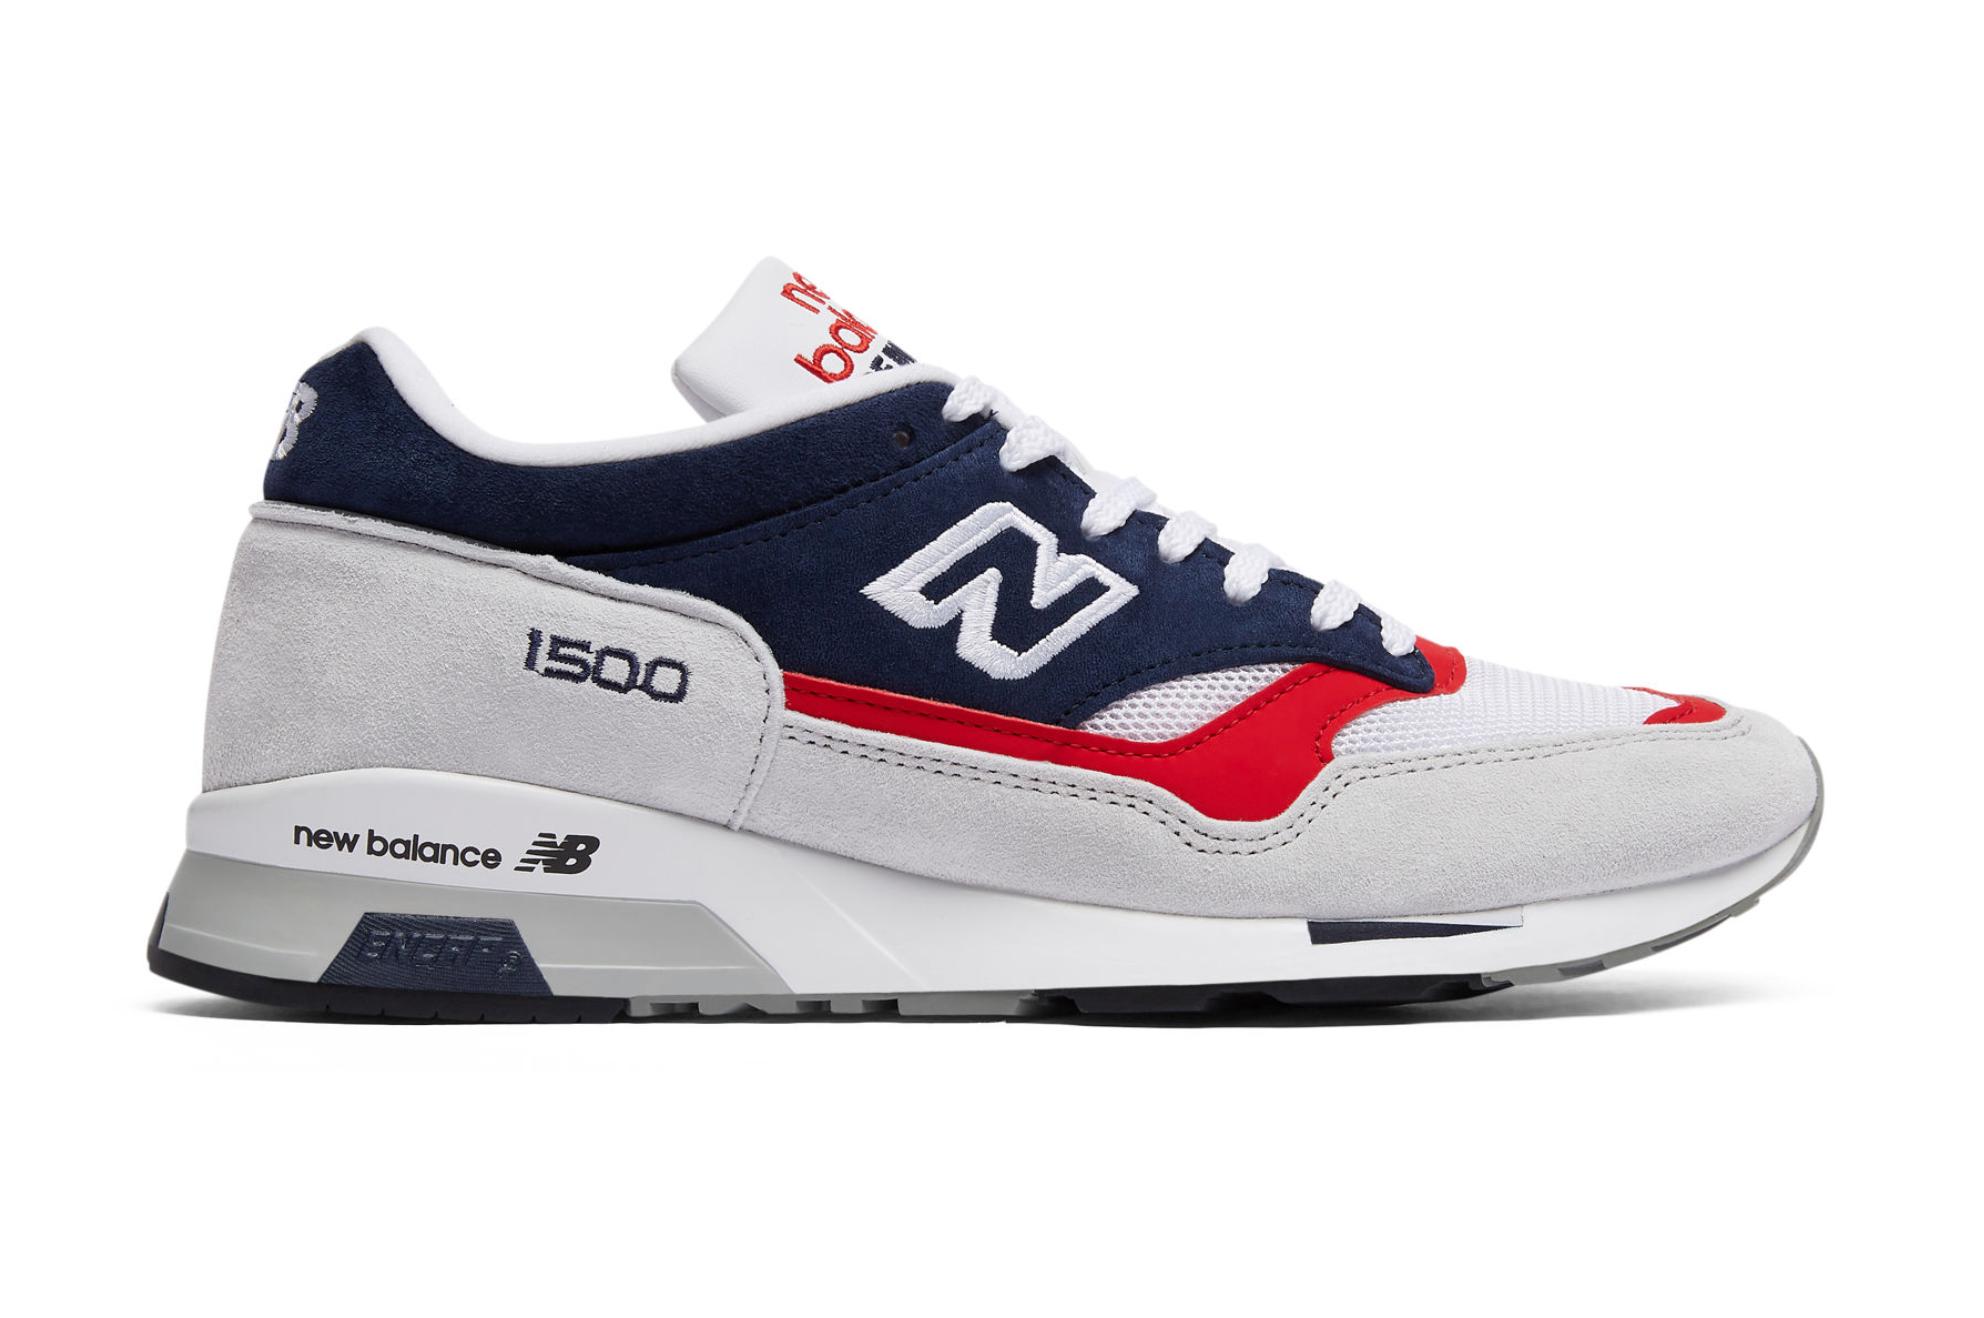 New Balance 1500 Grey/Navy